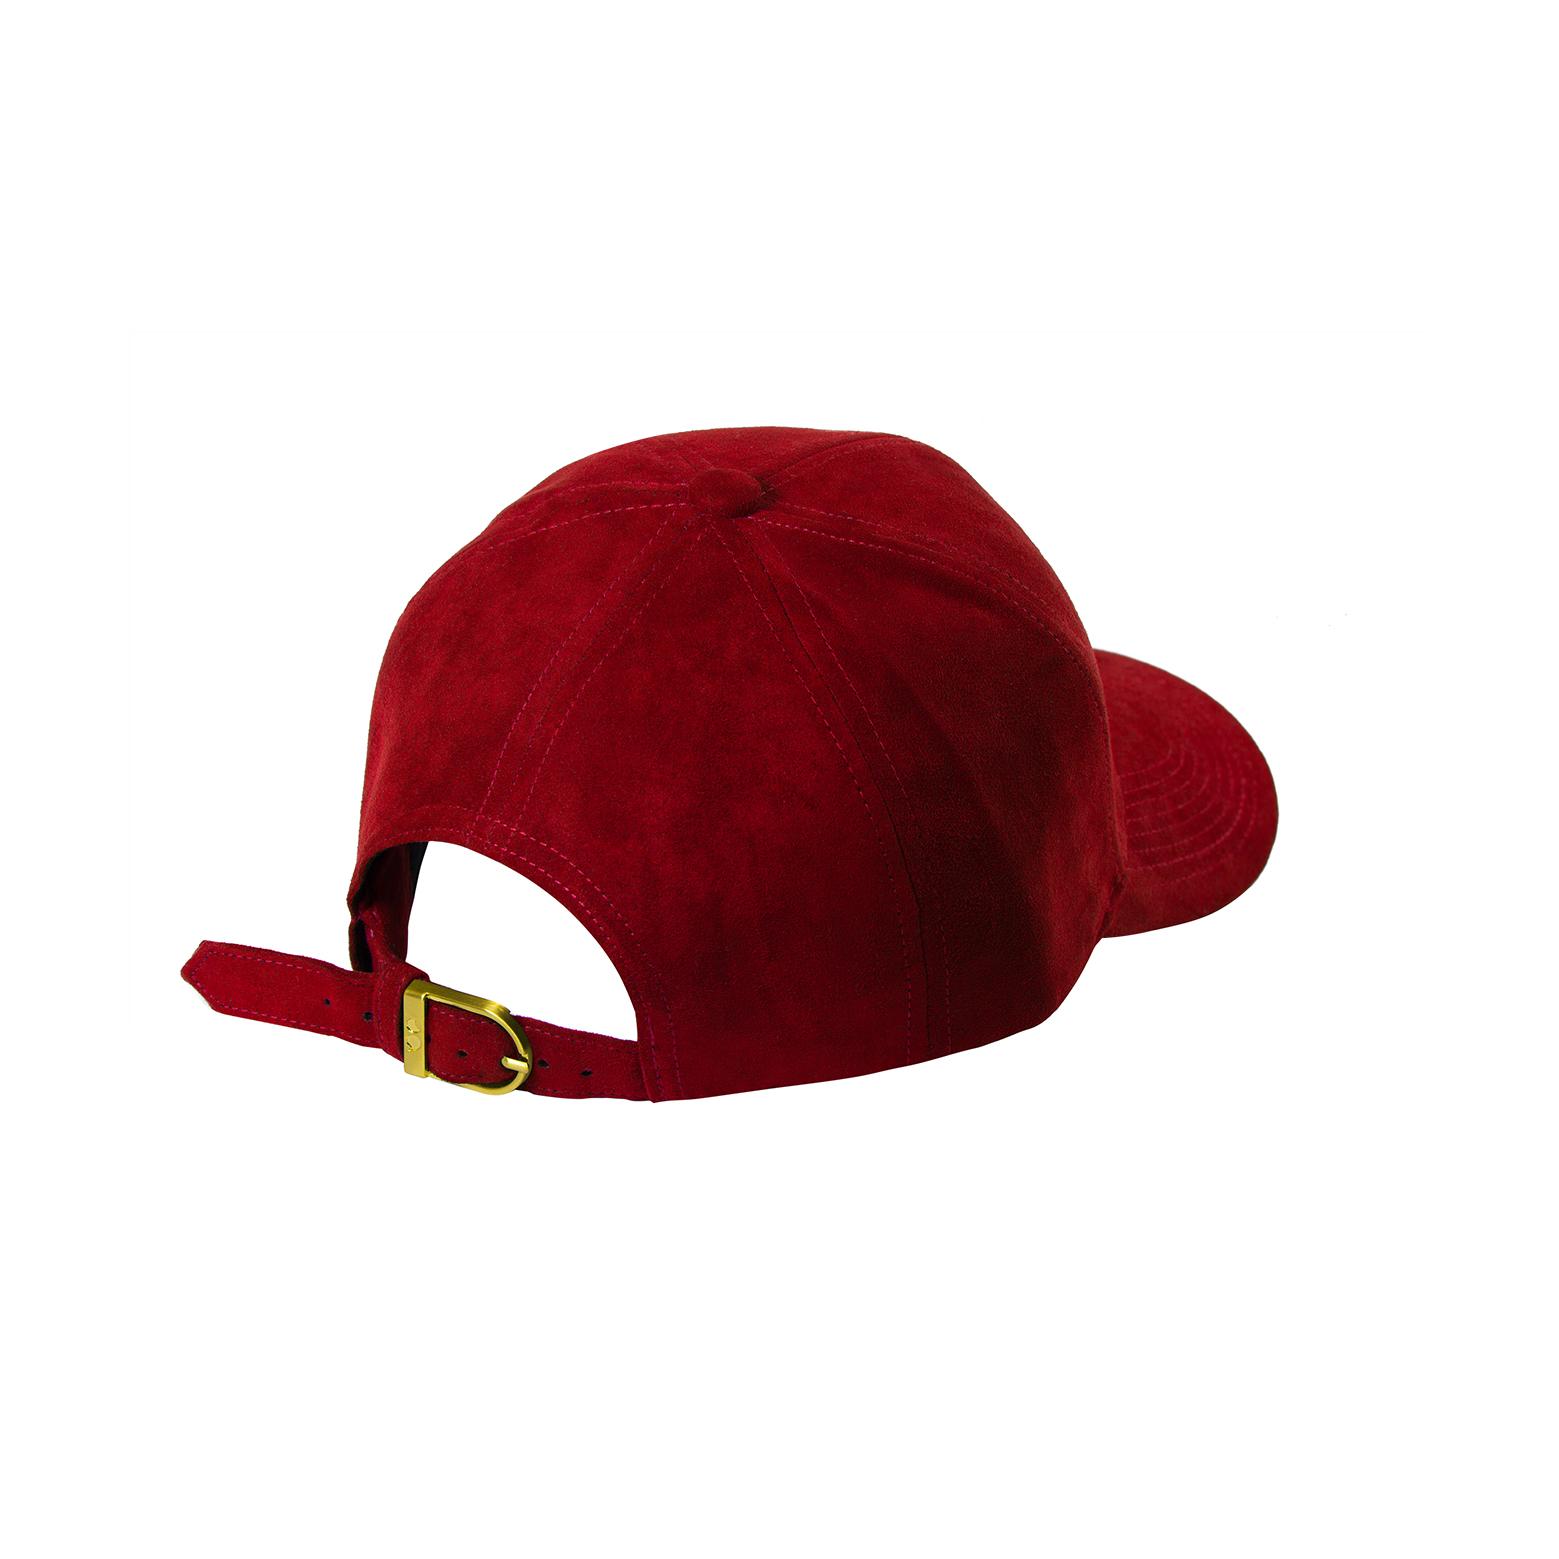 BASEBALL CAP RED SUEDE BACK SIDE